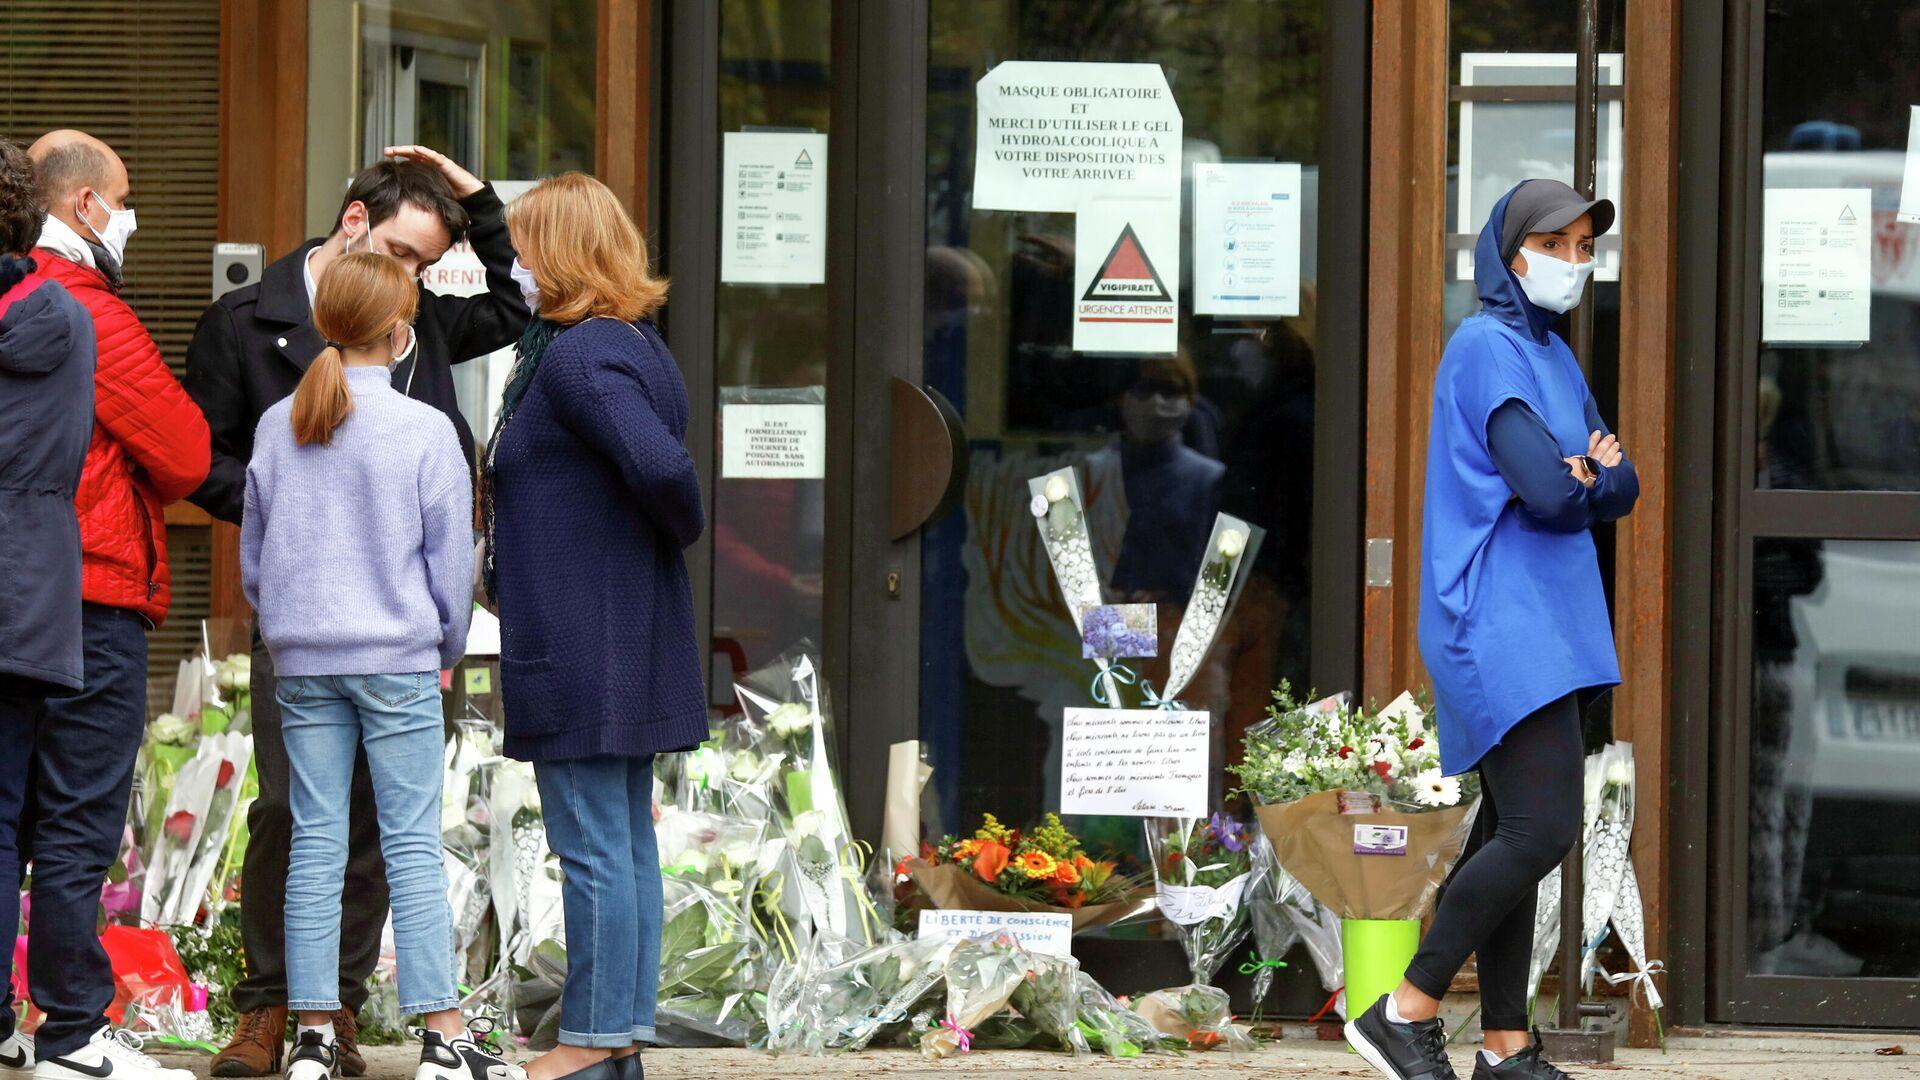 На месте убийства учителя в коммуне Конфлан-Сент-Онорин, Франция - РИА Новости, 1920, 17.10.2020